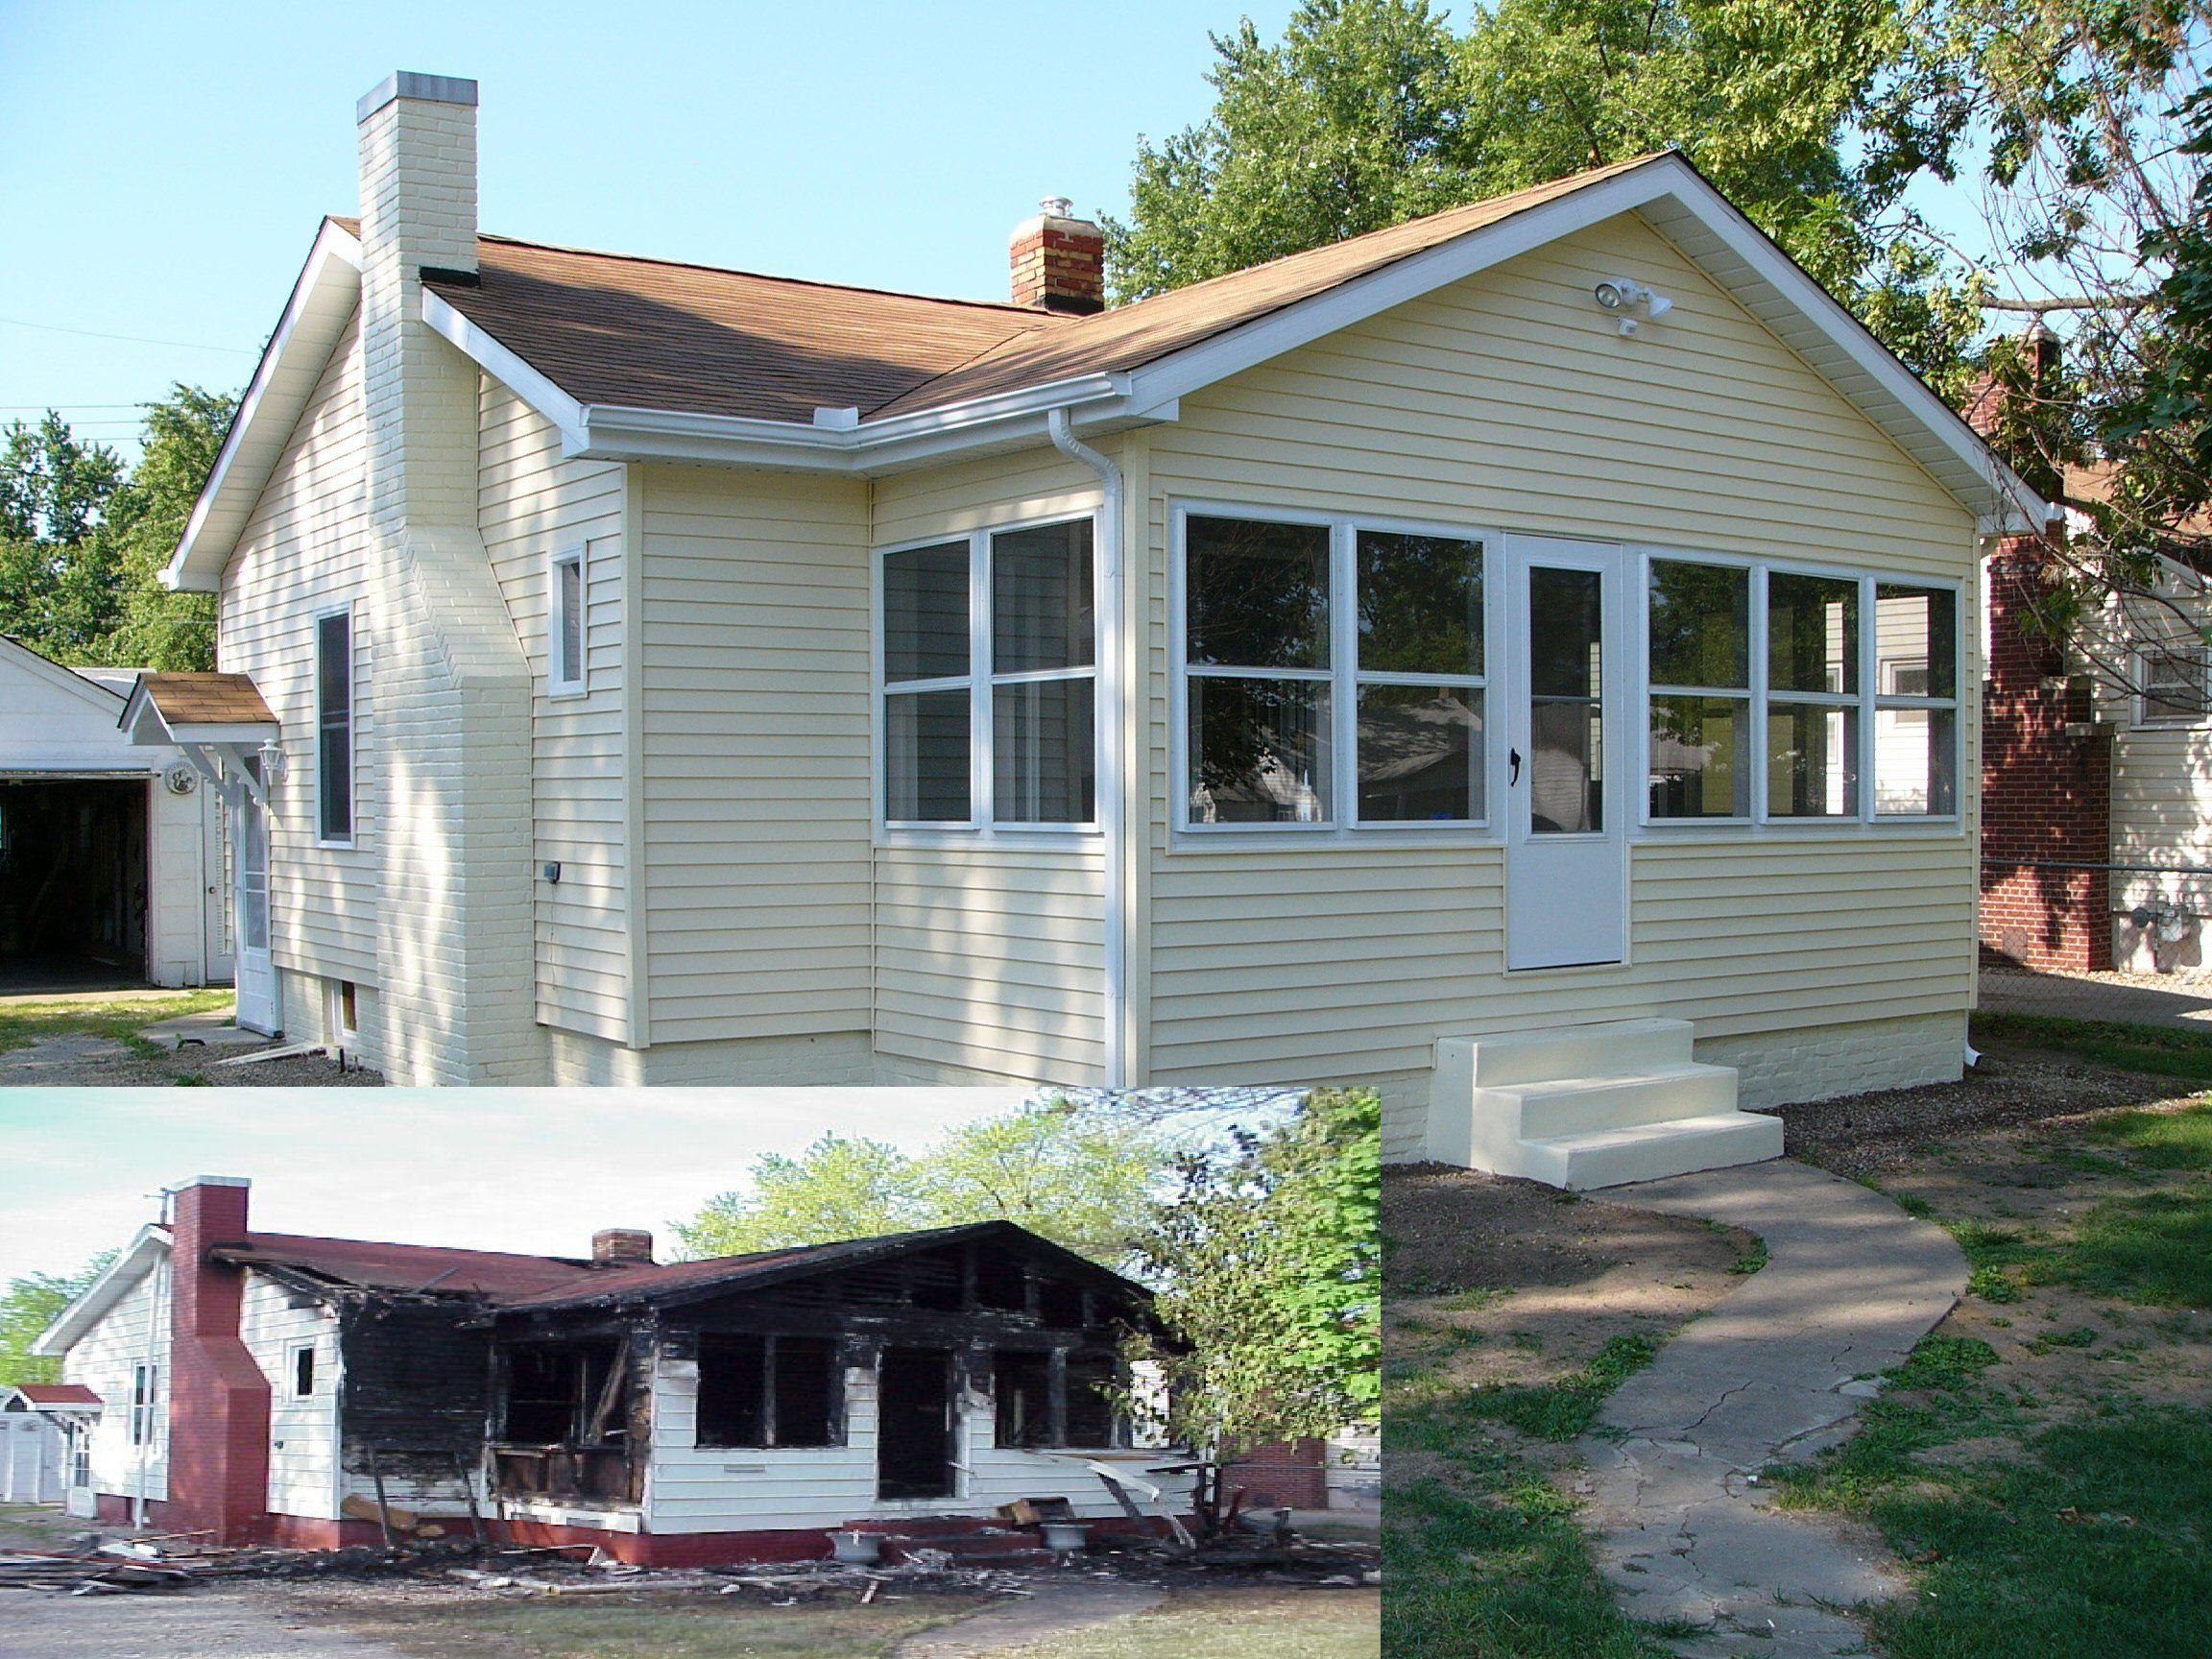 Home Remodel After Fire Damages Completed By J J Swartz